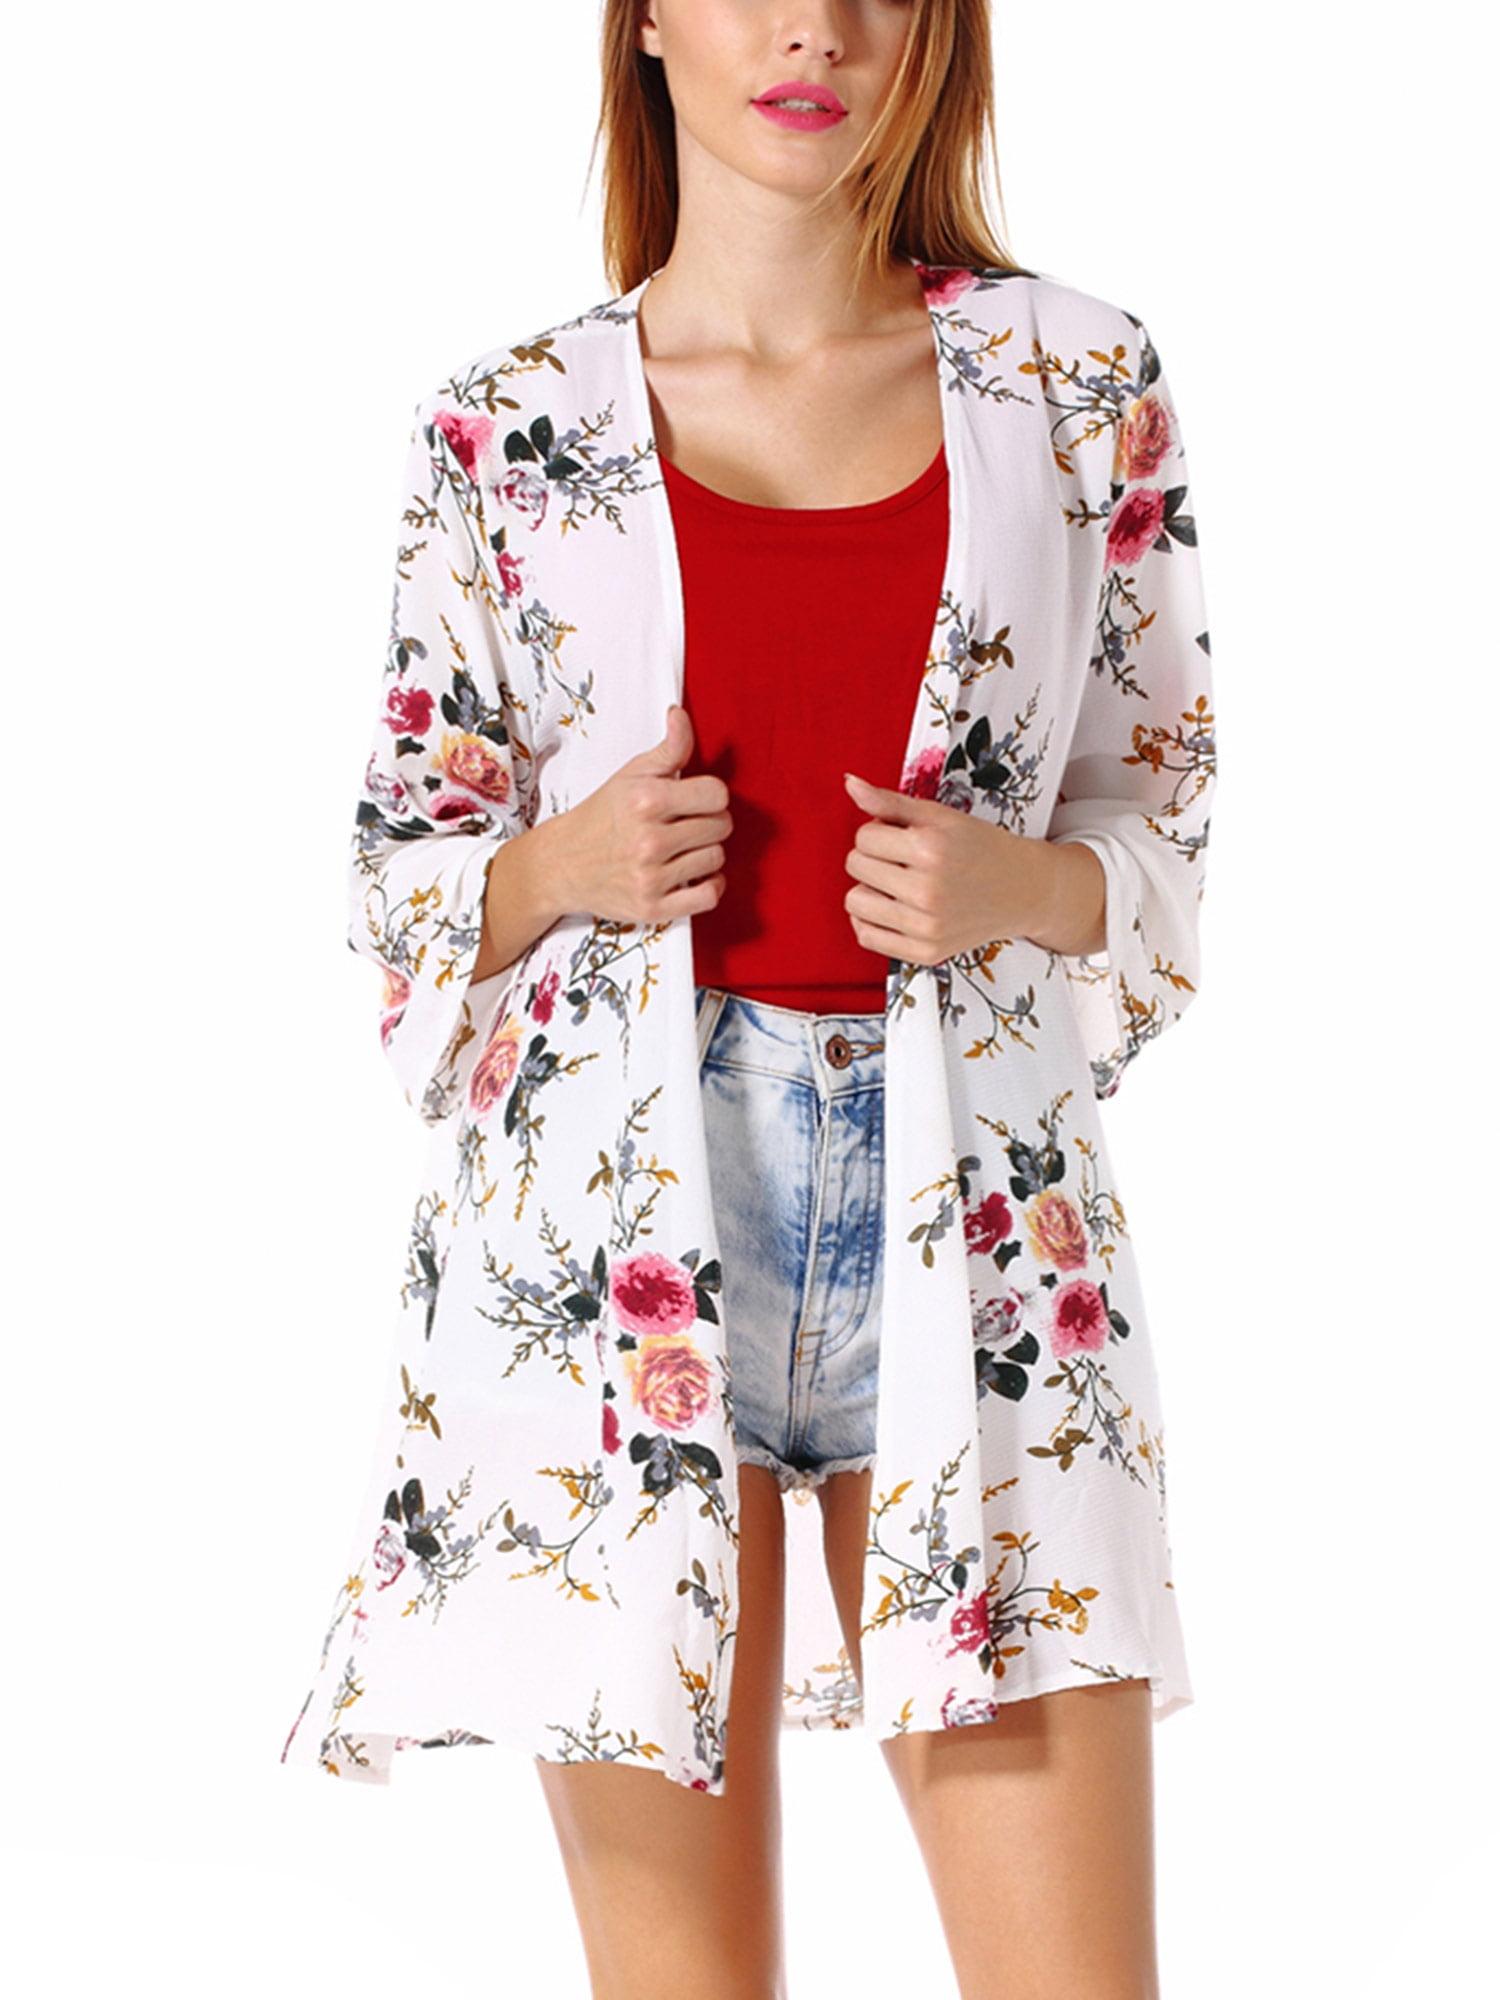 Plus Size Women's Kimono Cardigan Coat Blouse Tops Floral Print Half Sleeve Casual Cardigan Beach Cover up